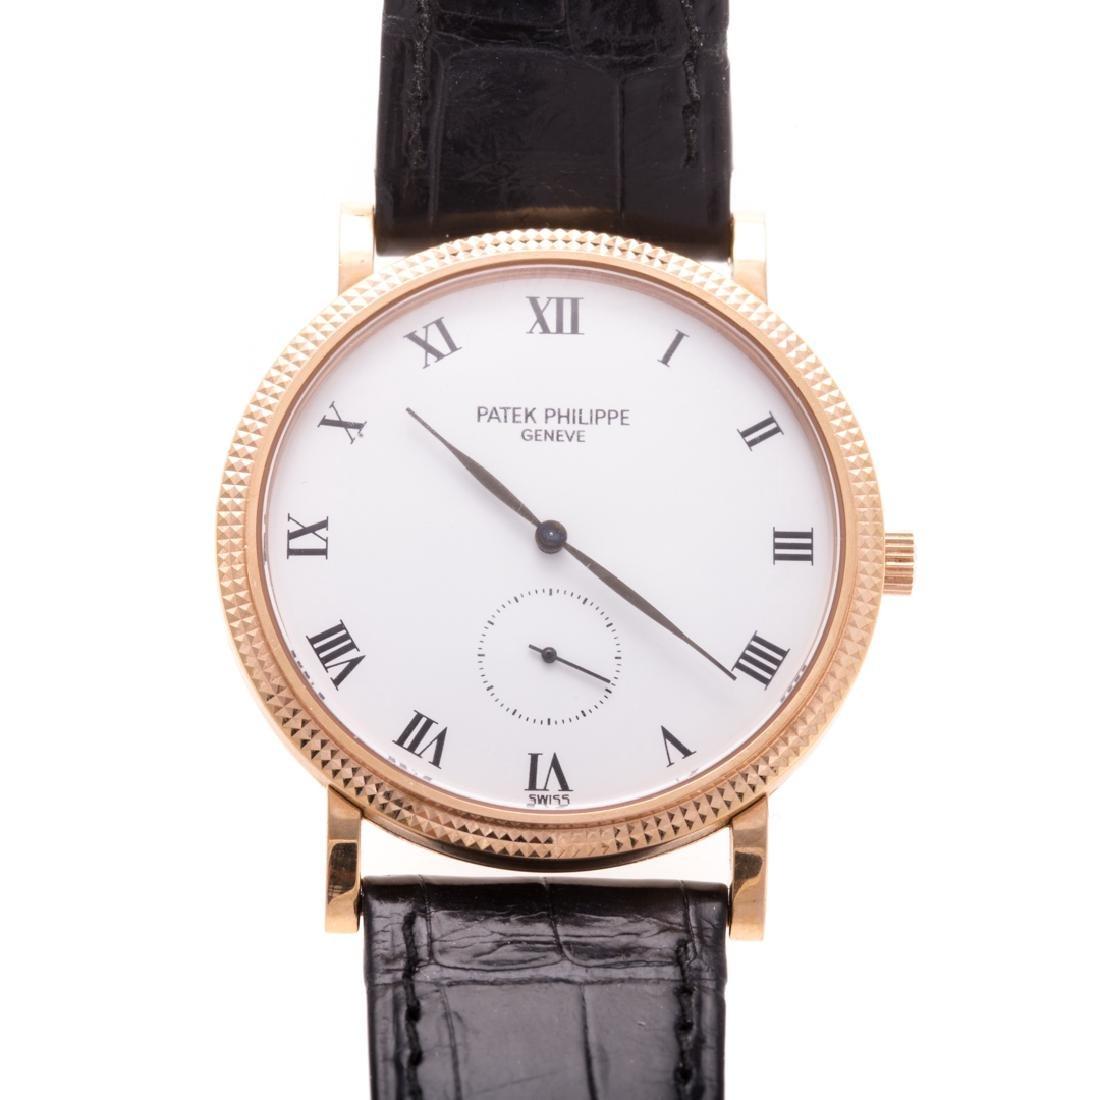 A Gentlemen's Patek Philippe Watch in 18K Gold